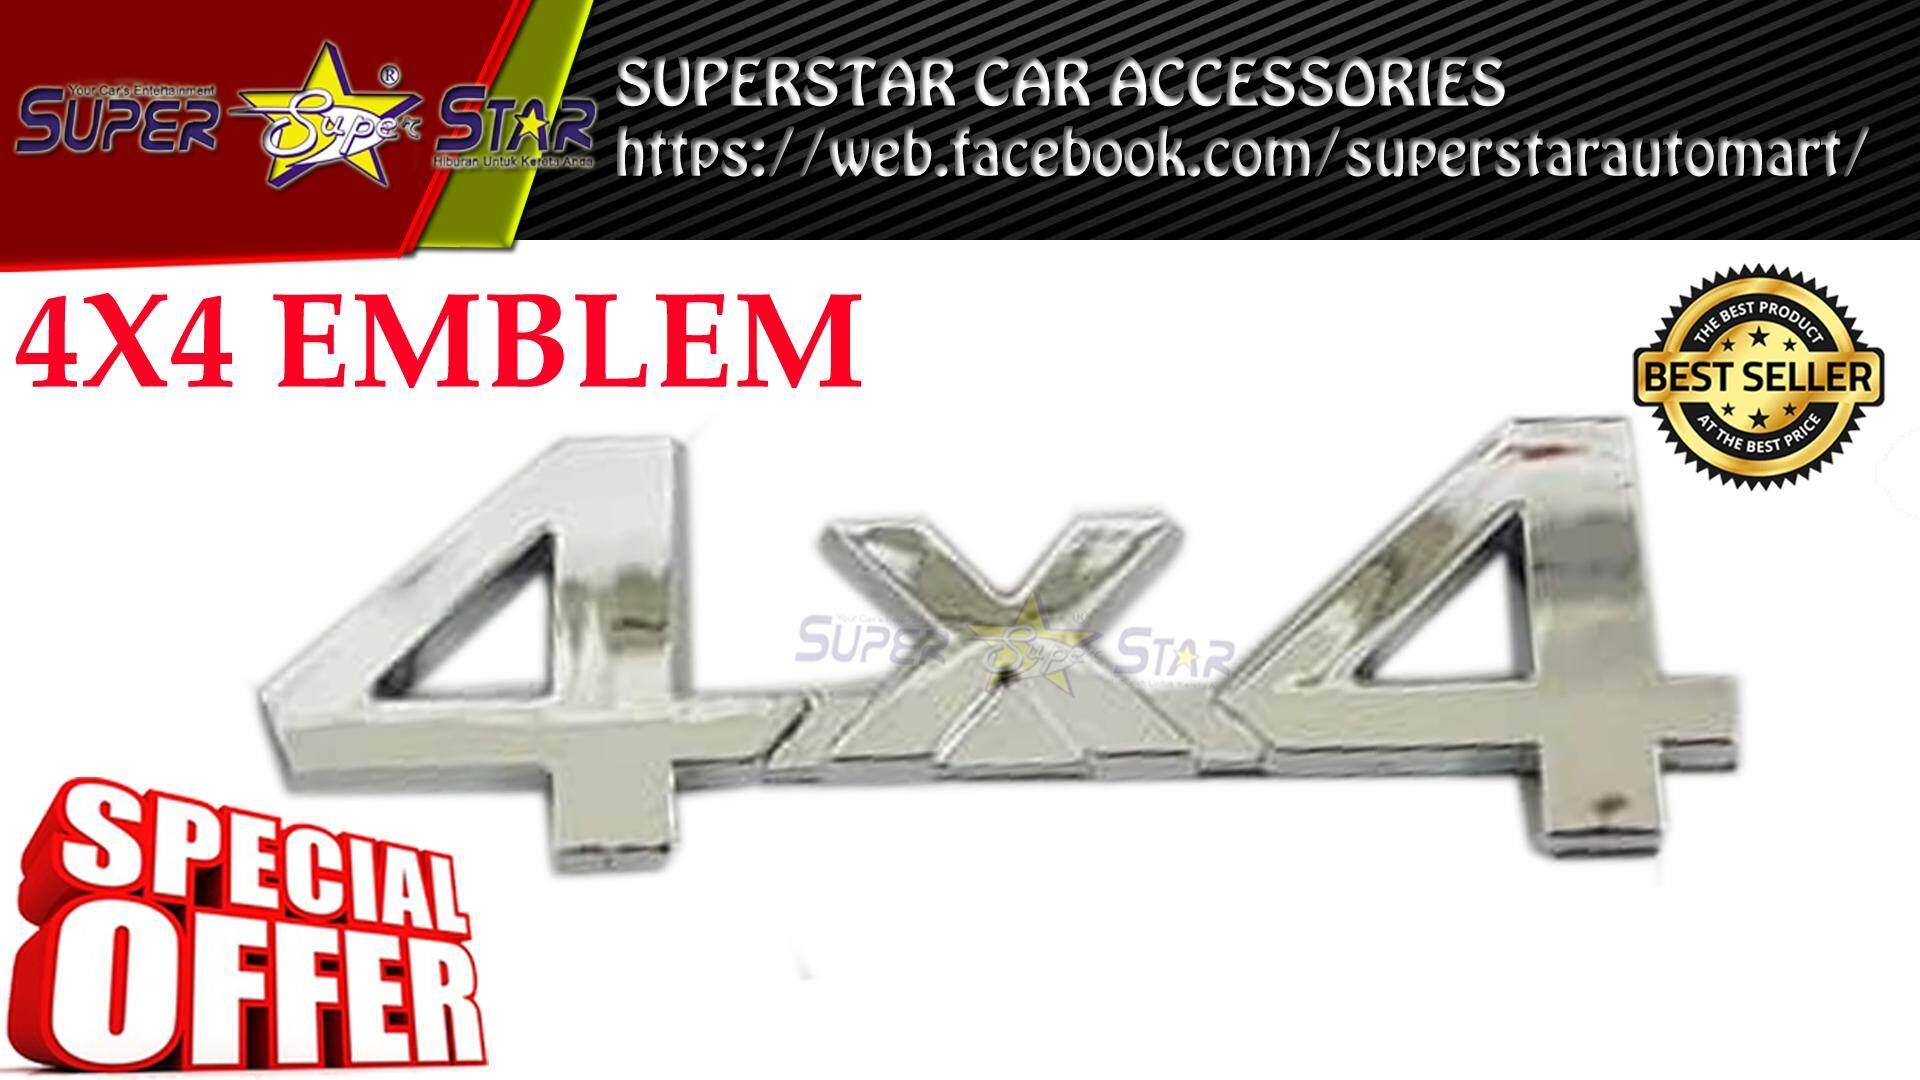 4X4 EMBLEM